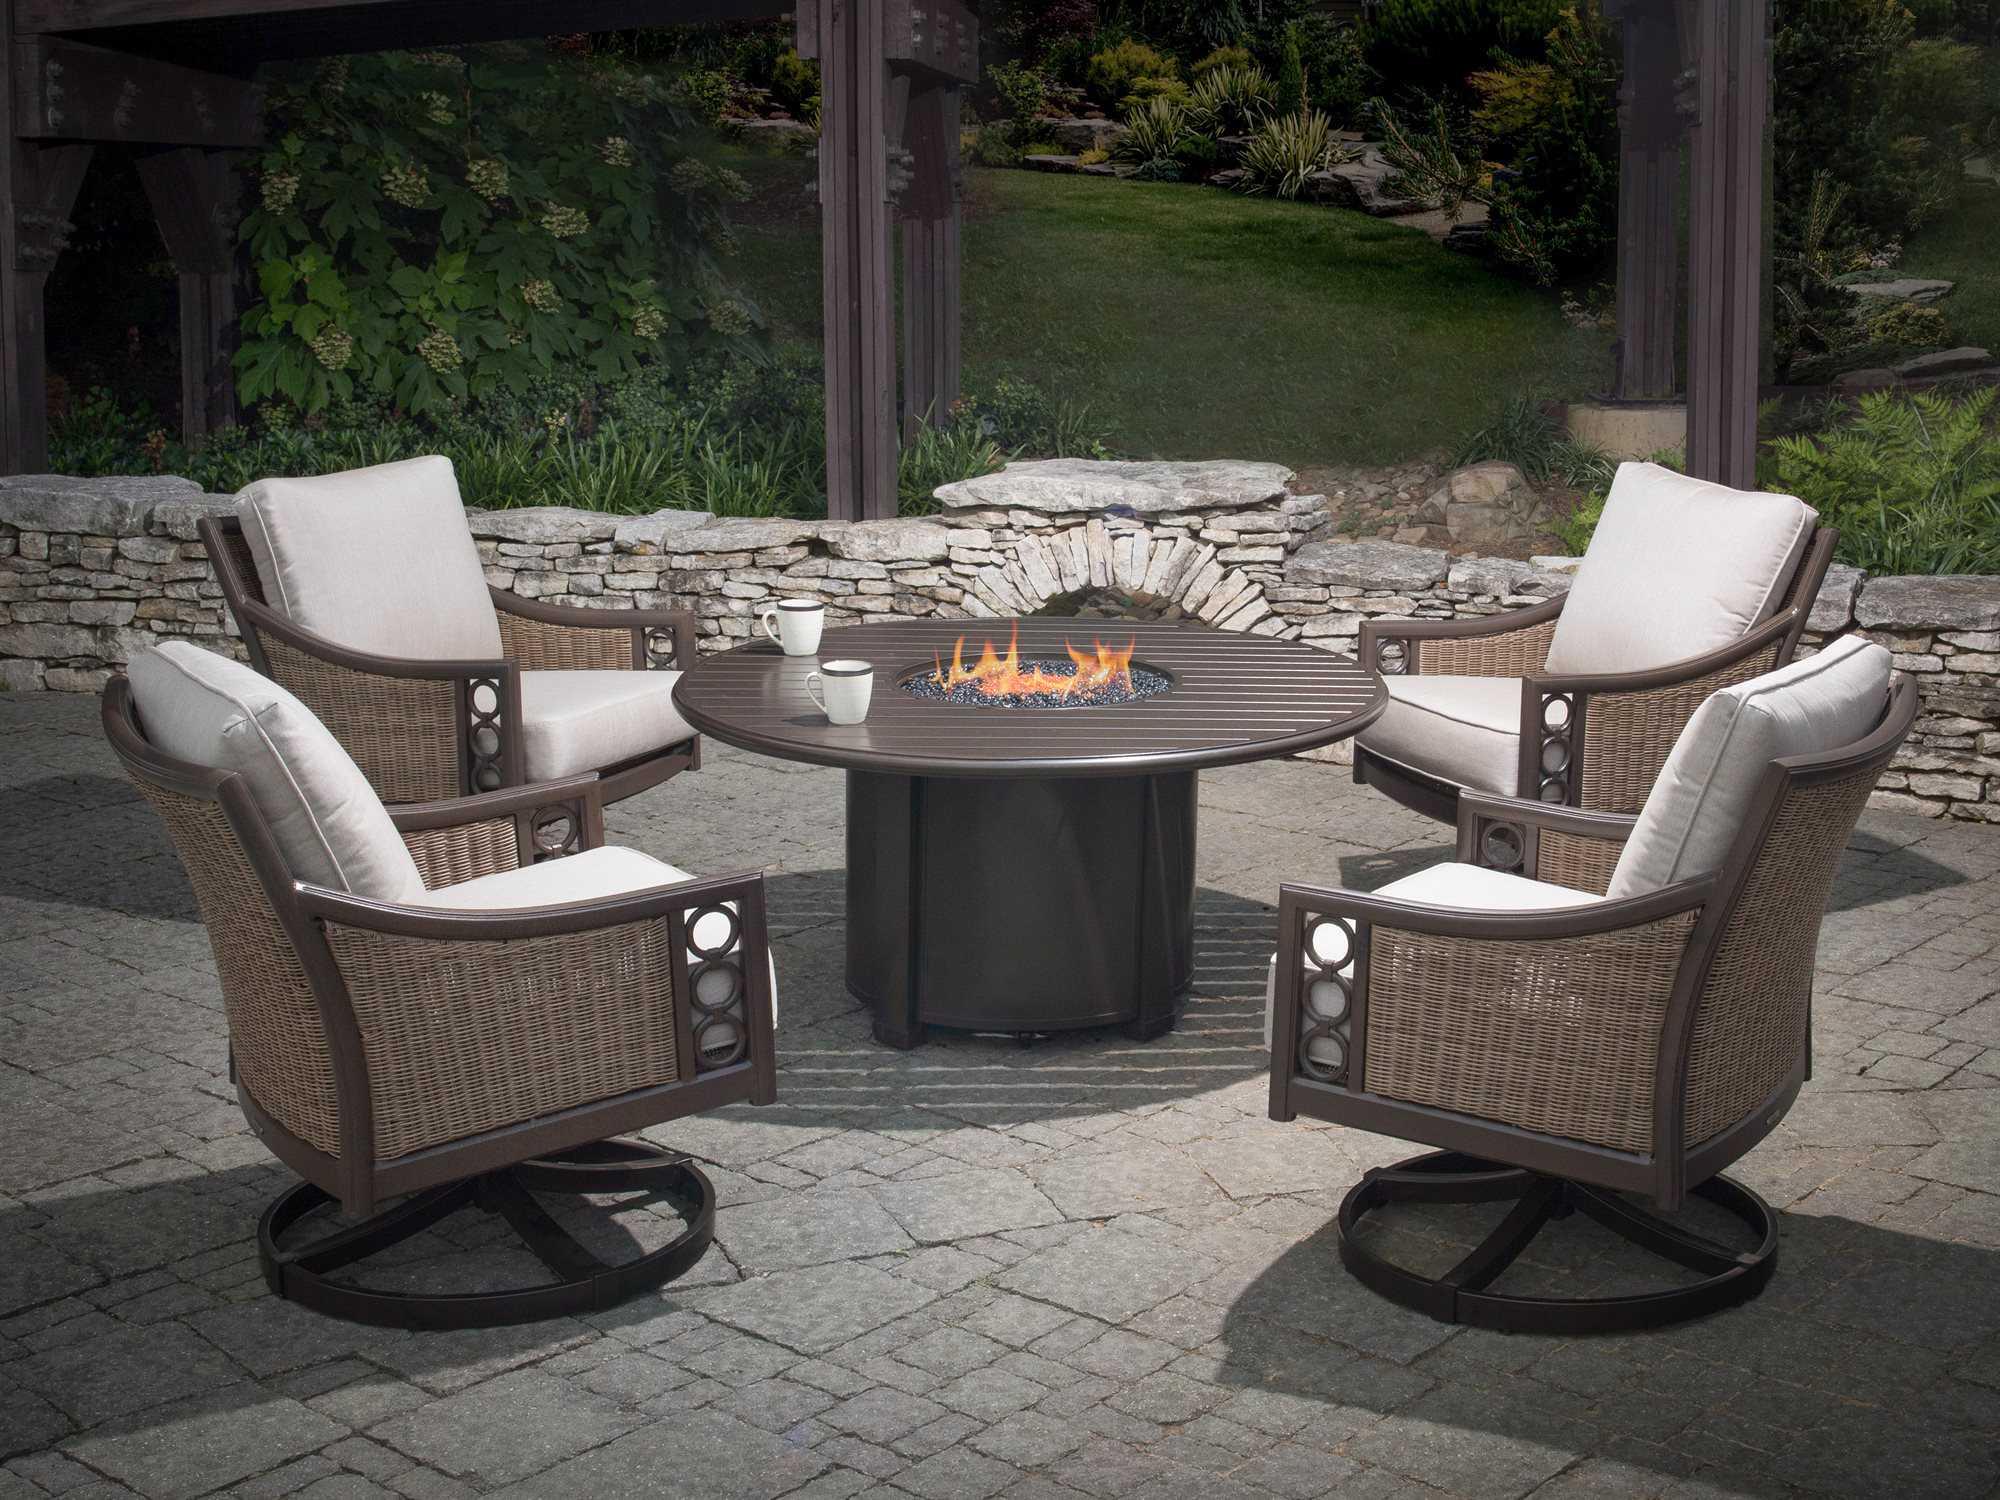 winston quick ship avignon wicker lounge set with 44 round. Black Bedroom Furniture Sets. Home Design Ideas